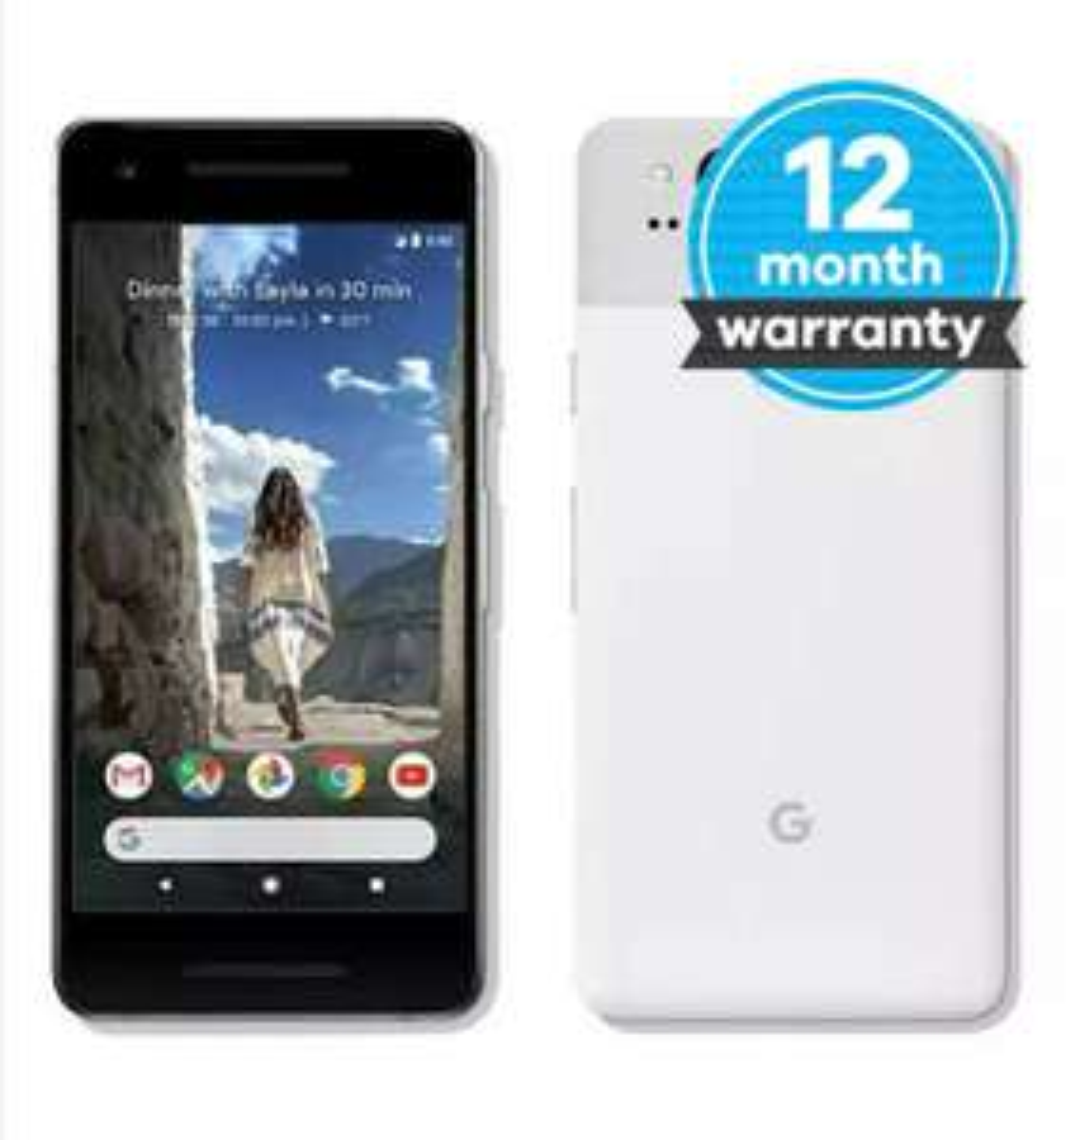 Google Pixel 2 64GB Smartphone £97.74 Good Condition | Sony XZ3 £169.99 | XZ Premium £84.99 | Mate 20x £369.99 VGC @ Music Magpie Ebay